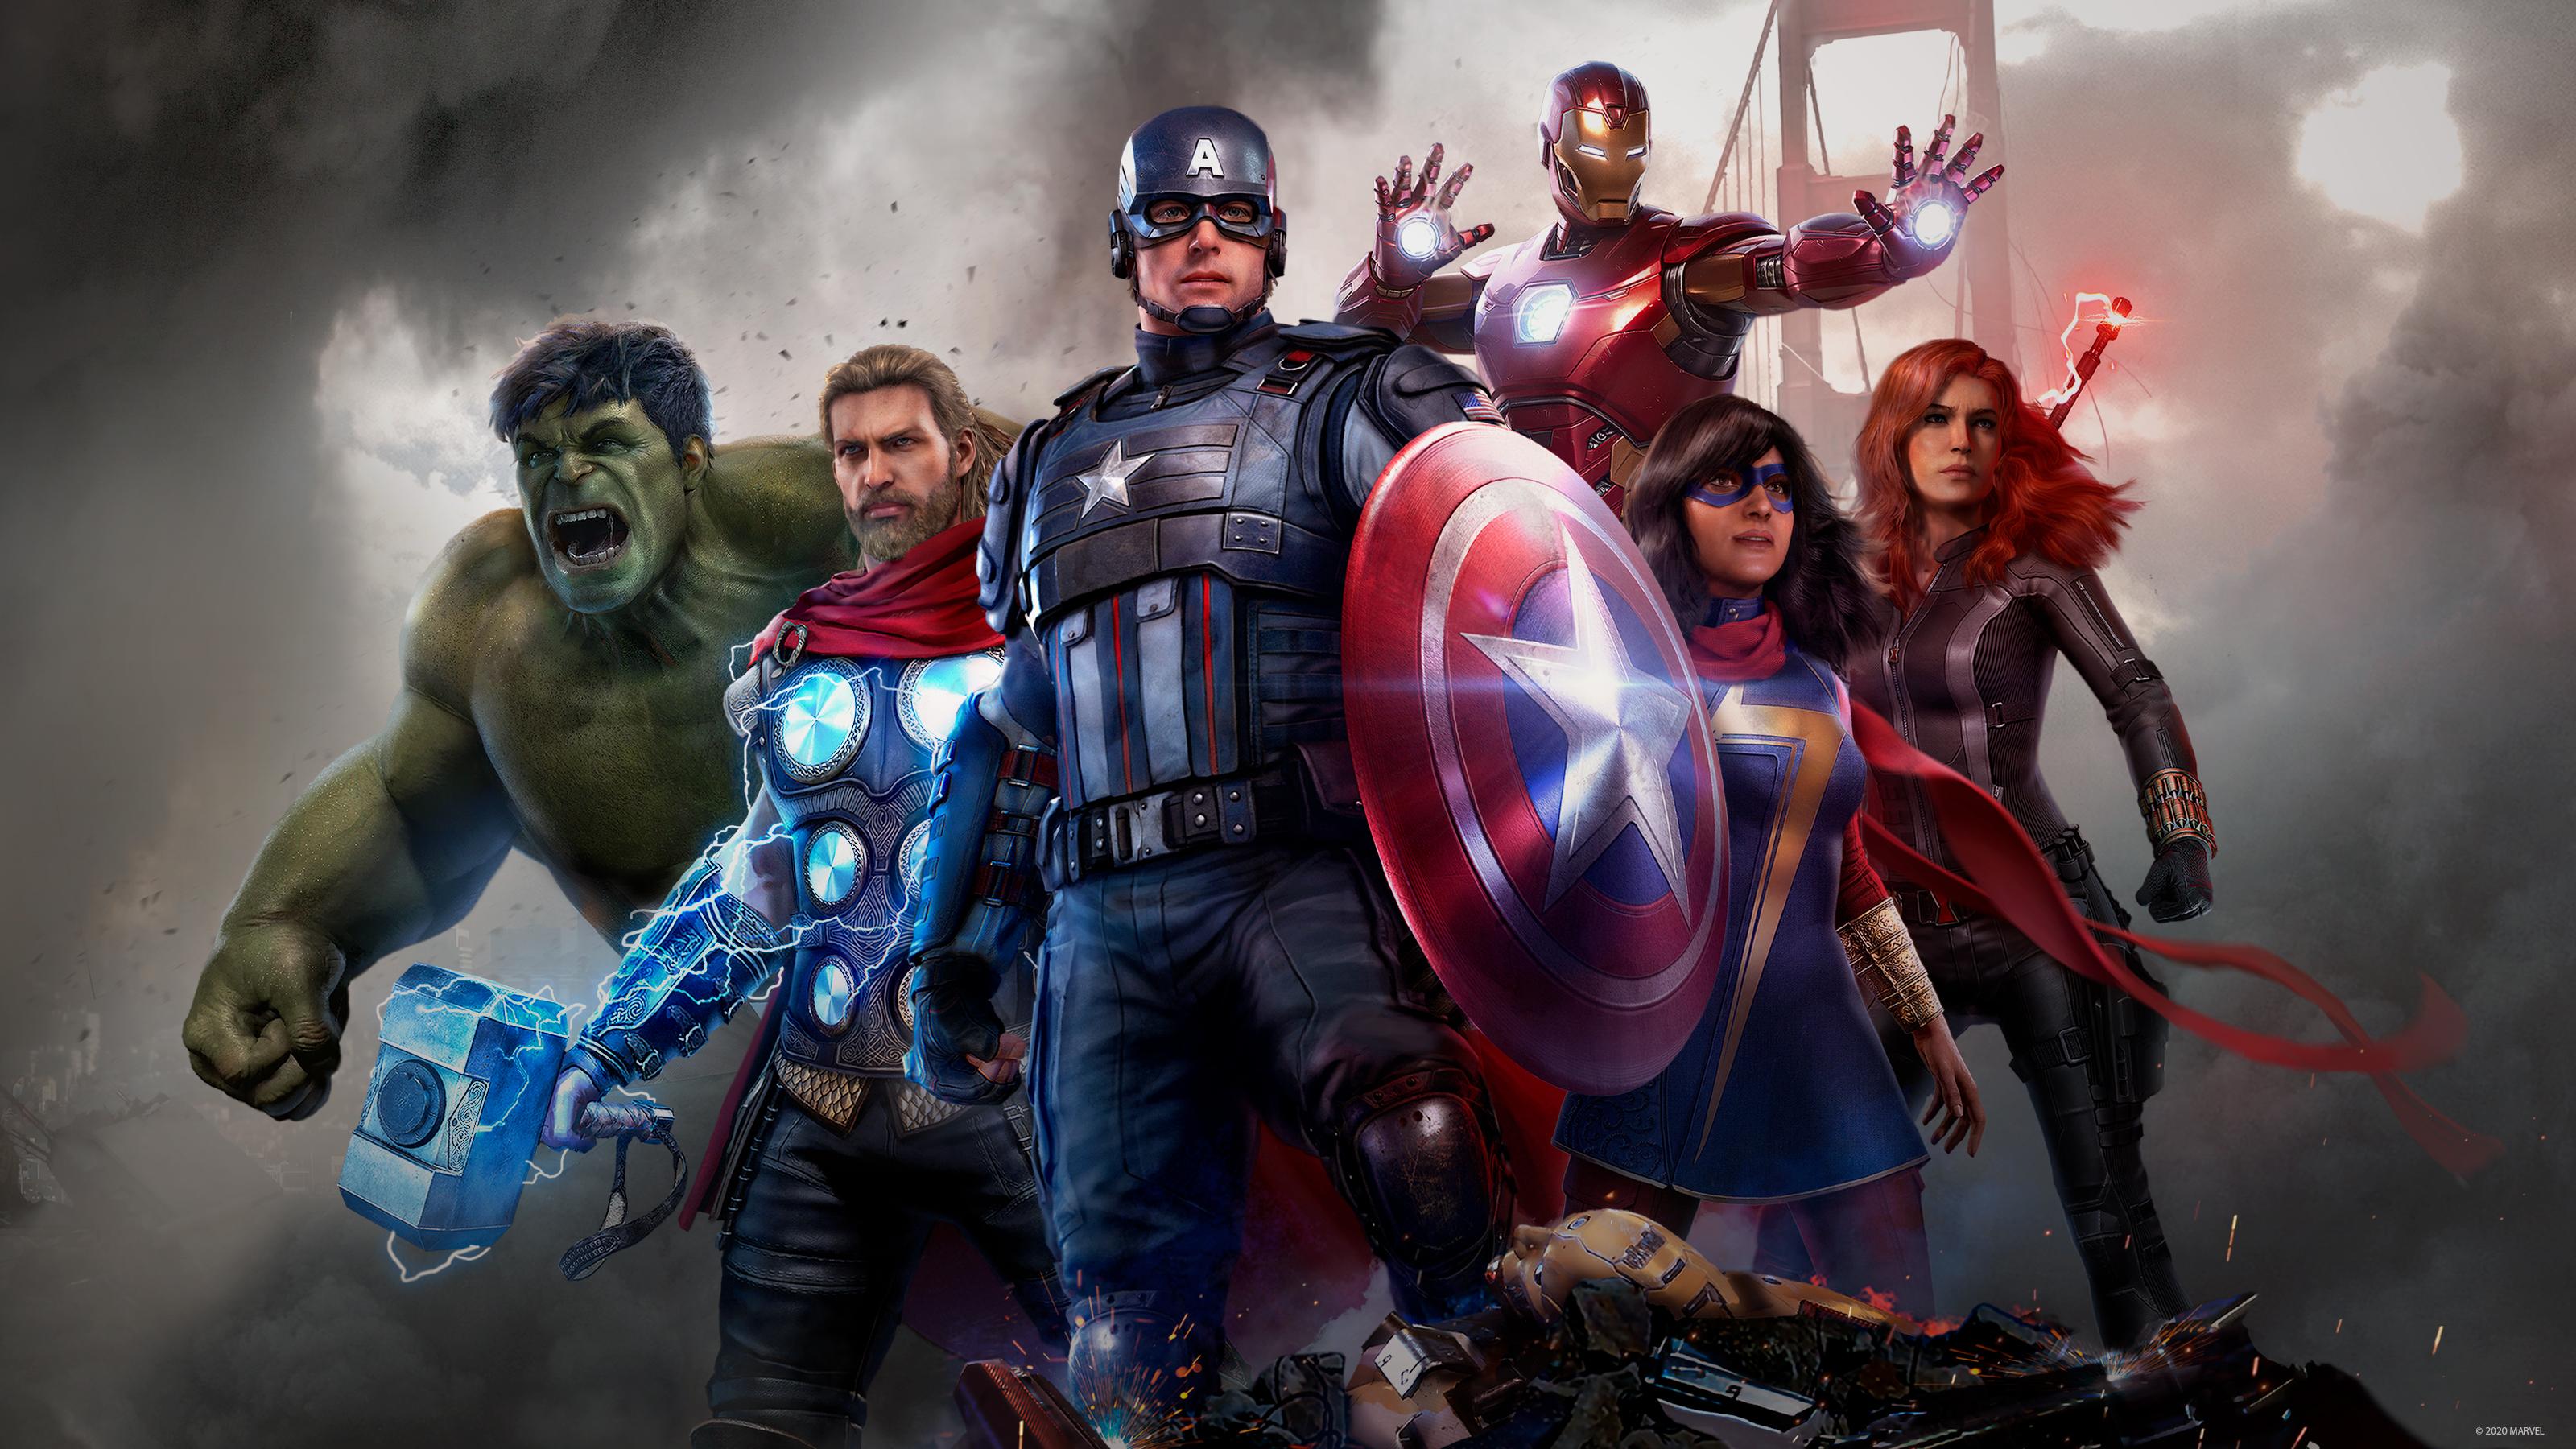 marvels avengers listingthumb 01 ps4 22jan19 en us